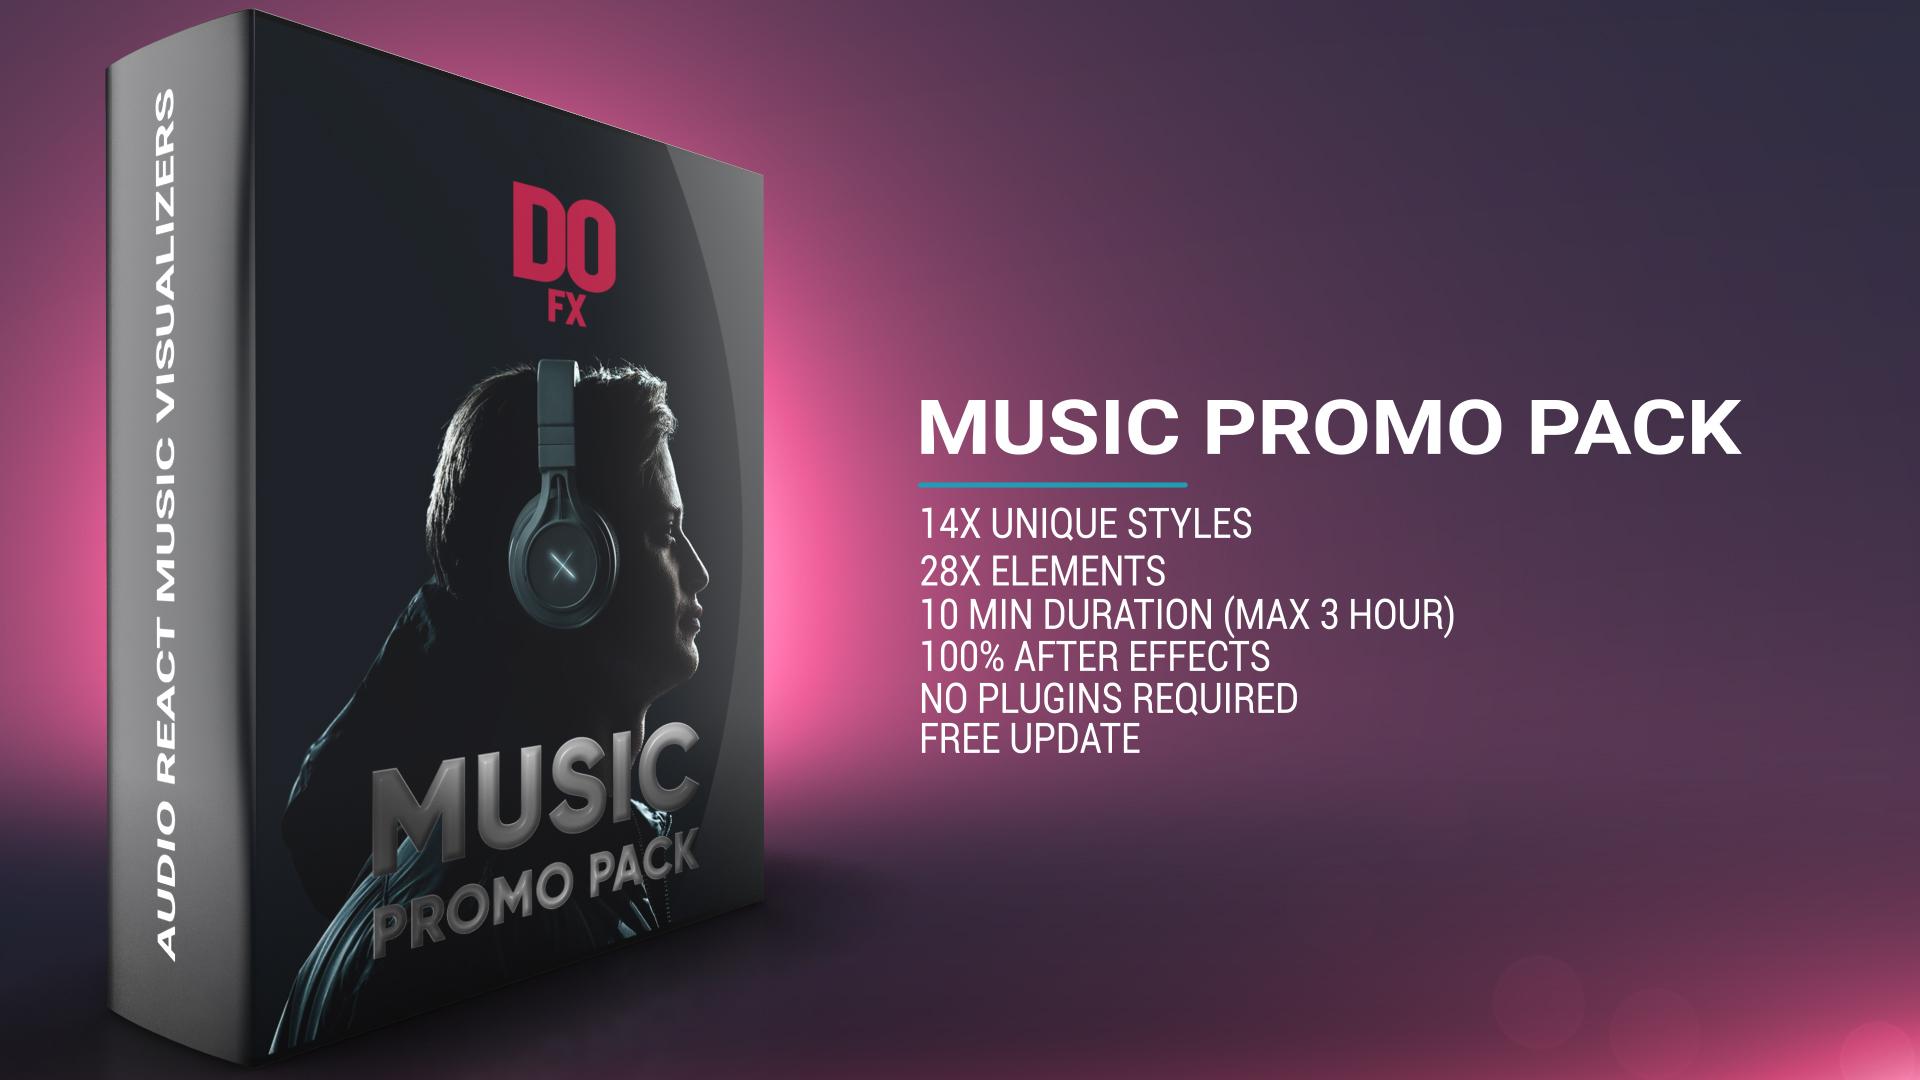 Music Promo Pack